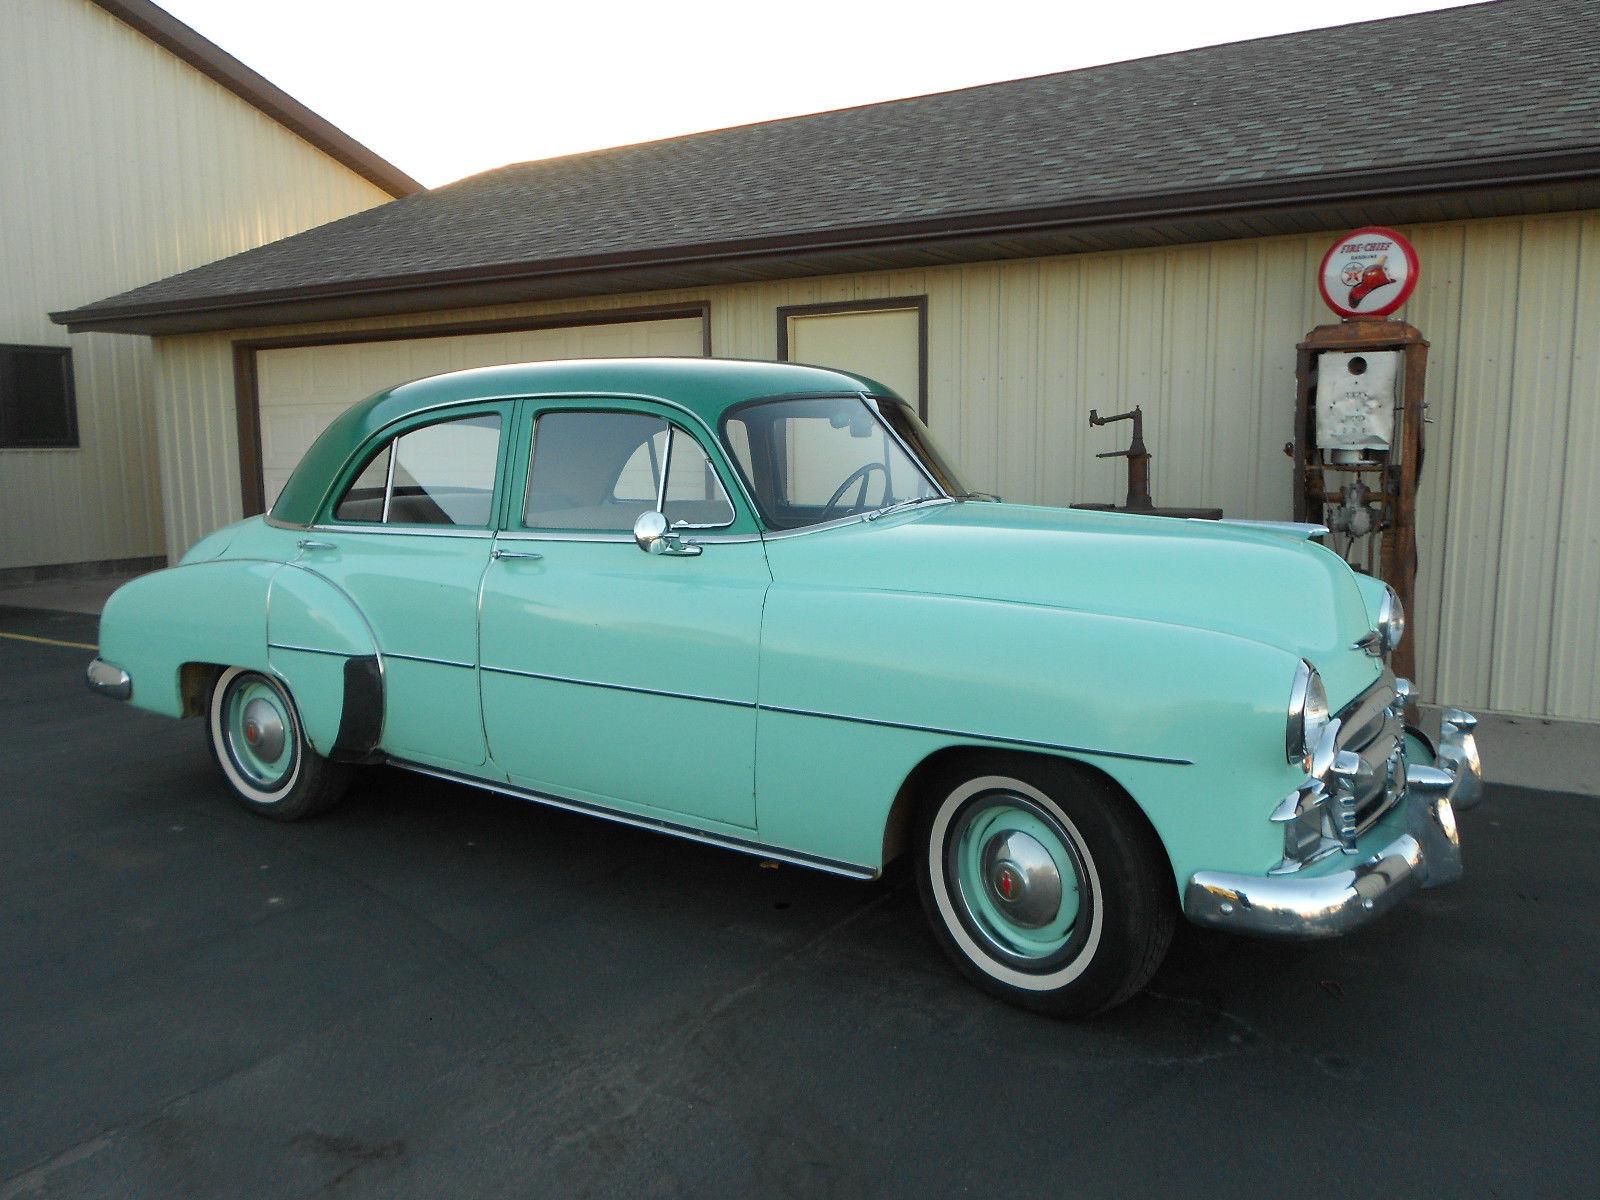 1950 chevy chevrolet styleline 4 door sedan original survivor 38 000 act miles classic. Black Bedroom Furniture Sets. Home Design Ideas